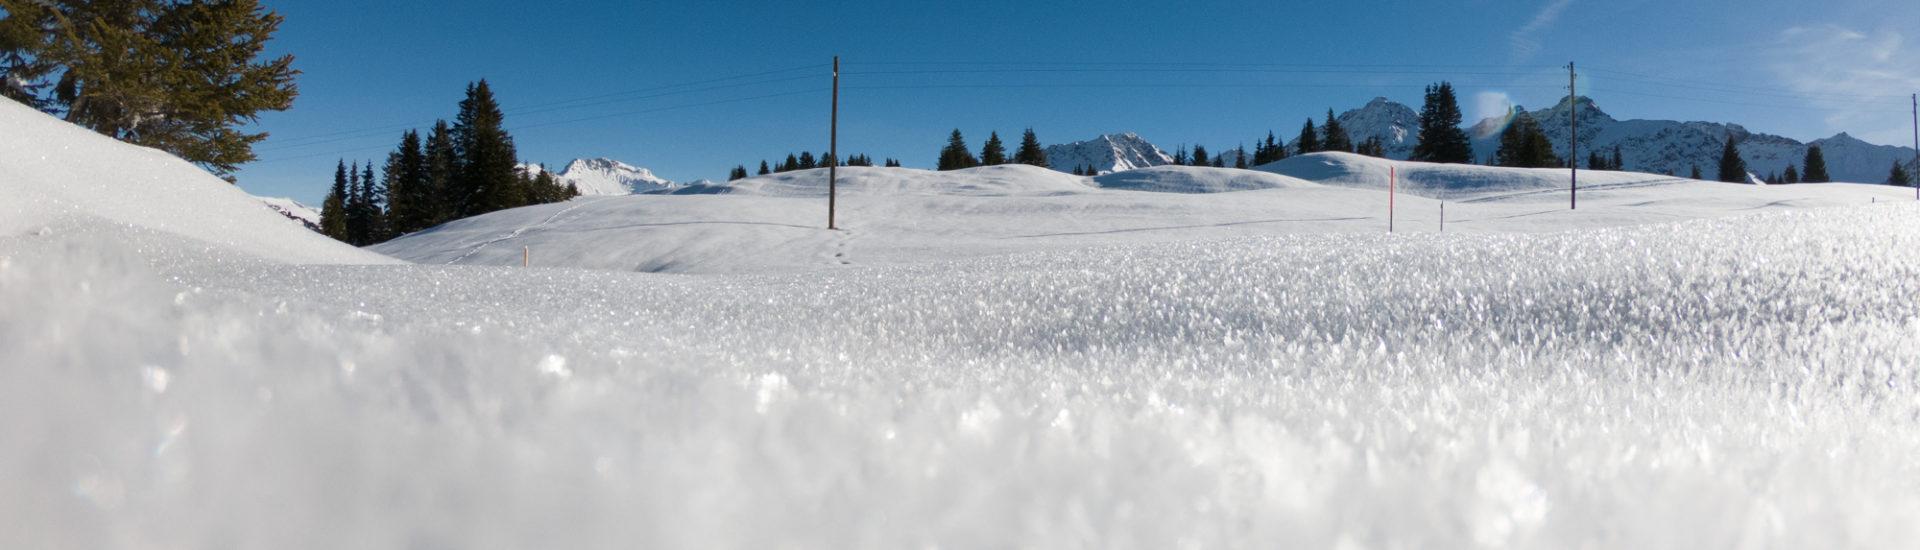 Unberührter Schnee nahe Arosa